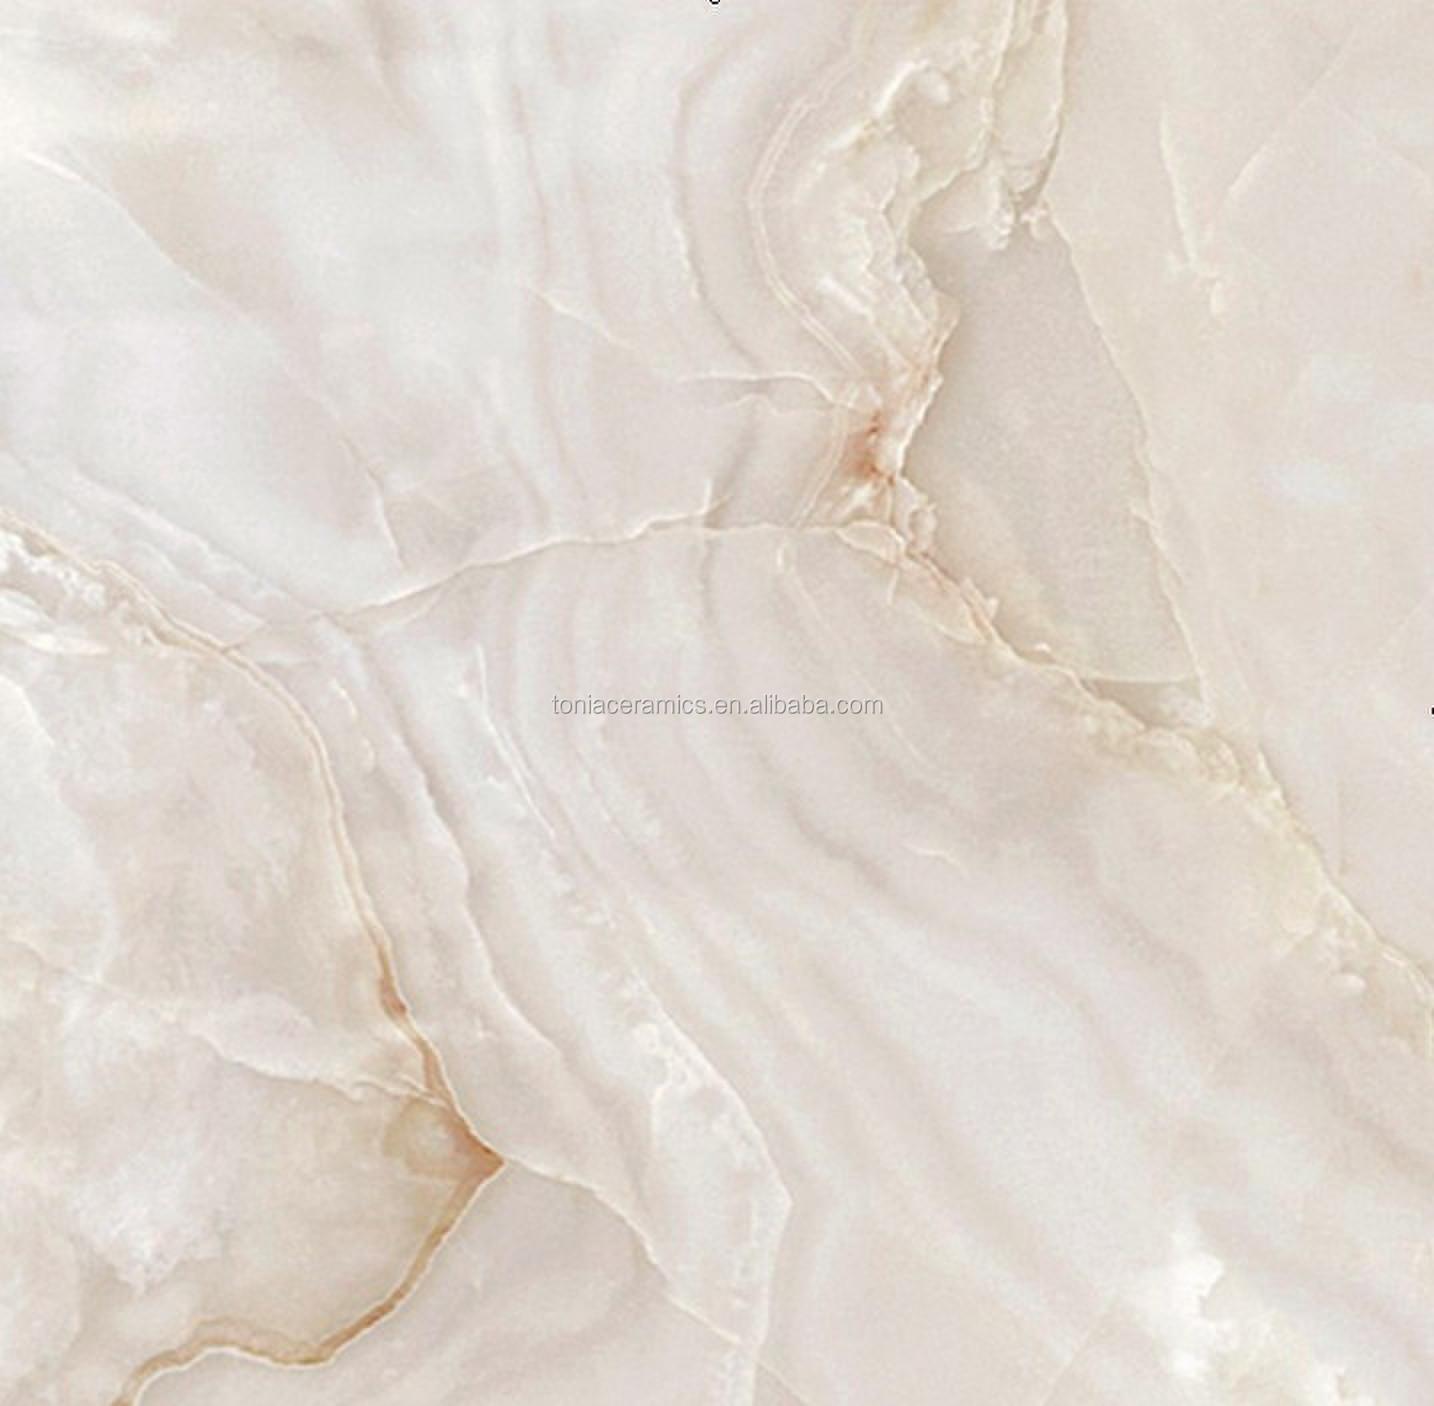 Foshan Copy White Marble Ceramic Tile Pricemarble Tiles Price In India Porcelain  Tile Looks Like Marble